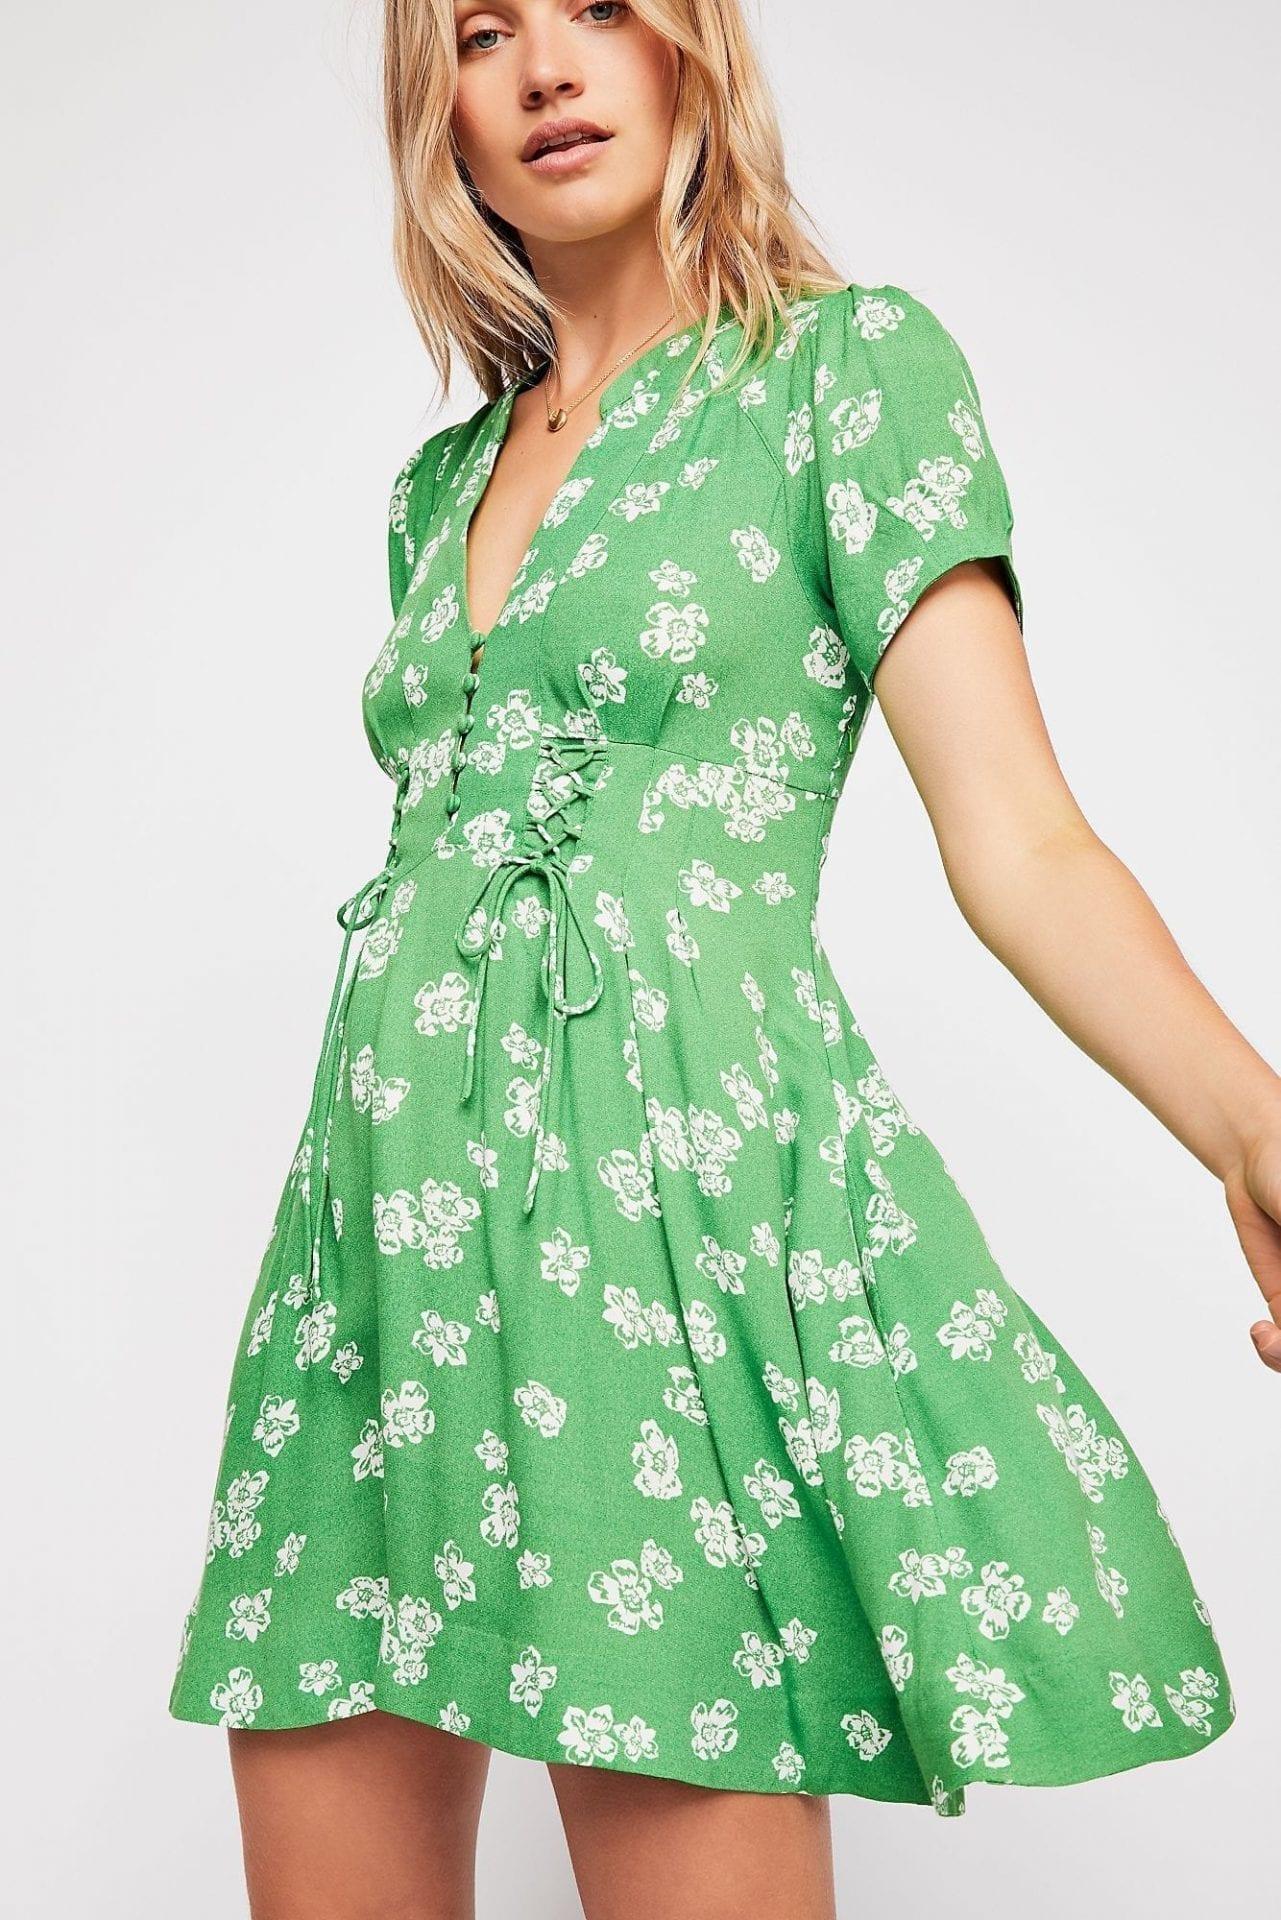 b6fcb18c785 New Dresses - Page 56 of 105 - We Select Dresses